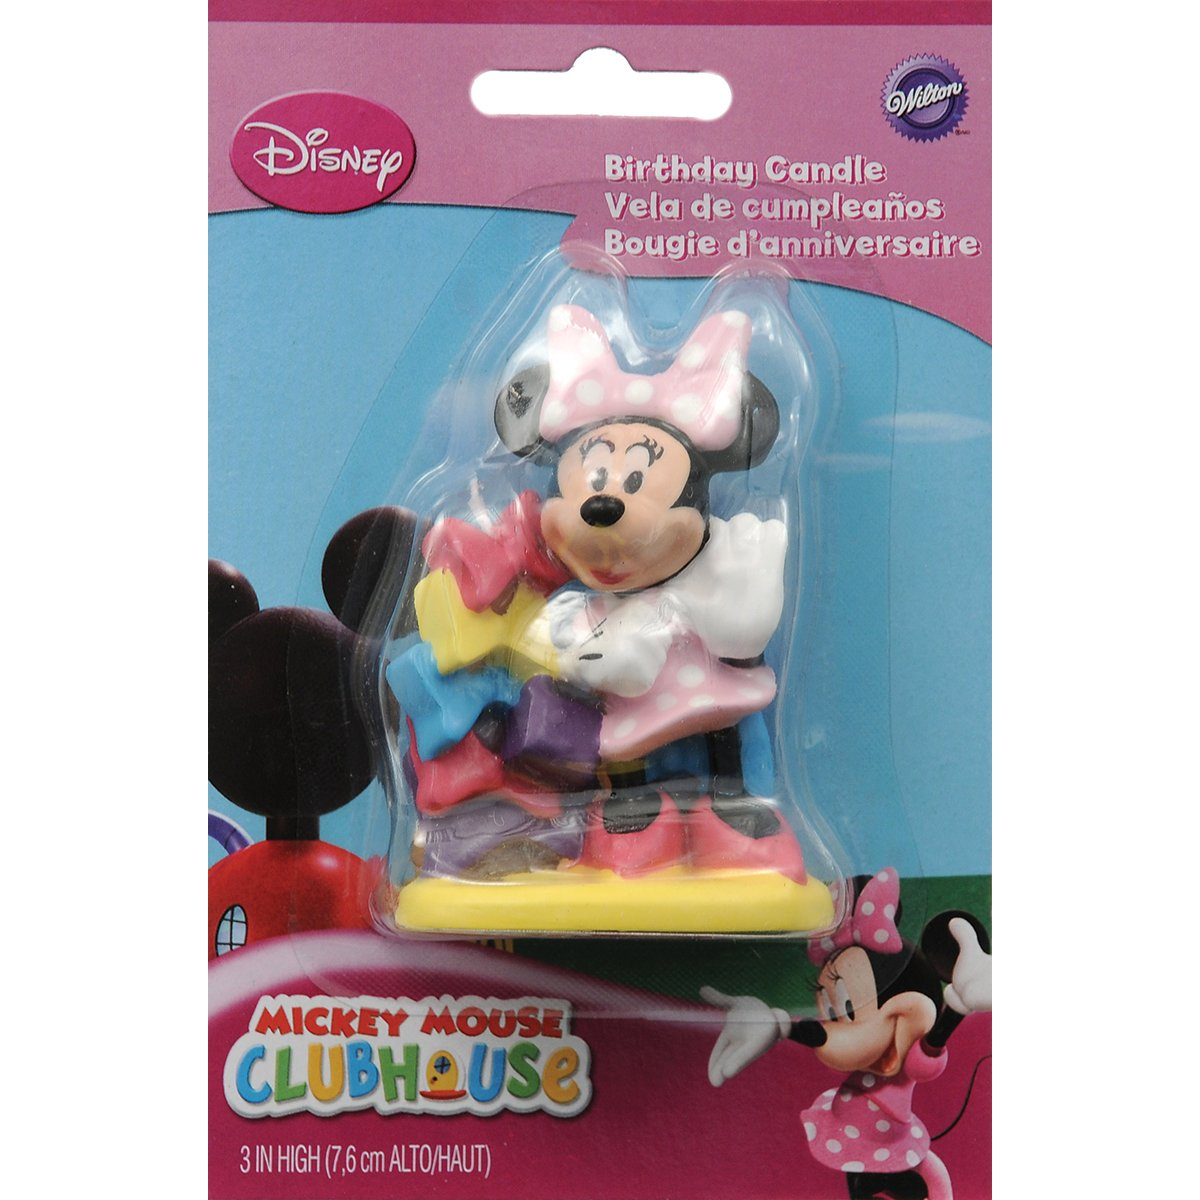 Minnie Mouse Cake Decoration: Amazon com